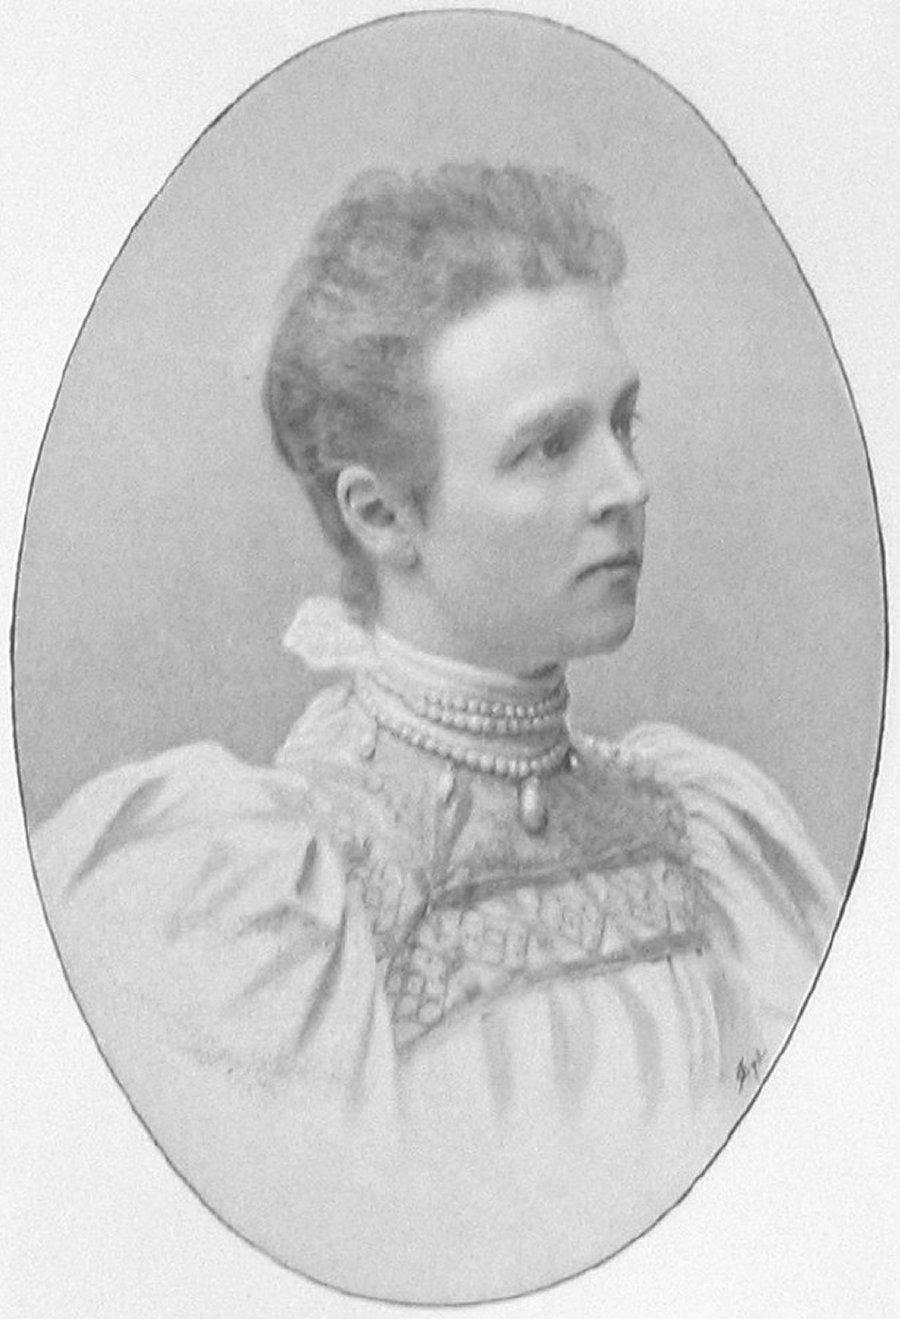 Countess Ebba Bernadotte wears the necklace